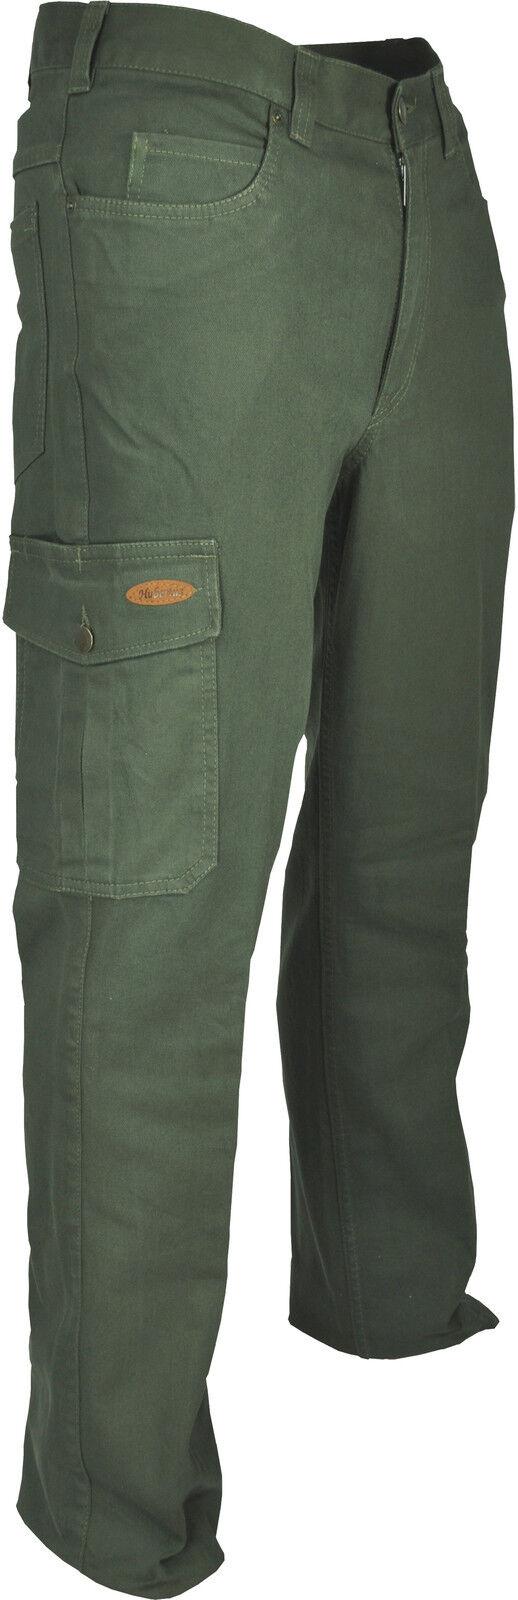 Jeans tiempo libre pantalones caza pantalones 5 Pocket Stretch Bolsa pierna Hubertus